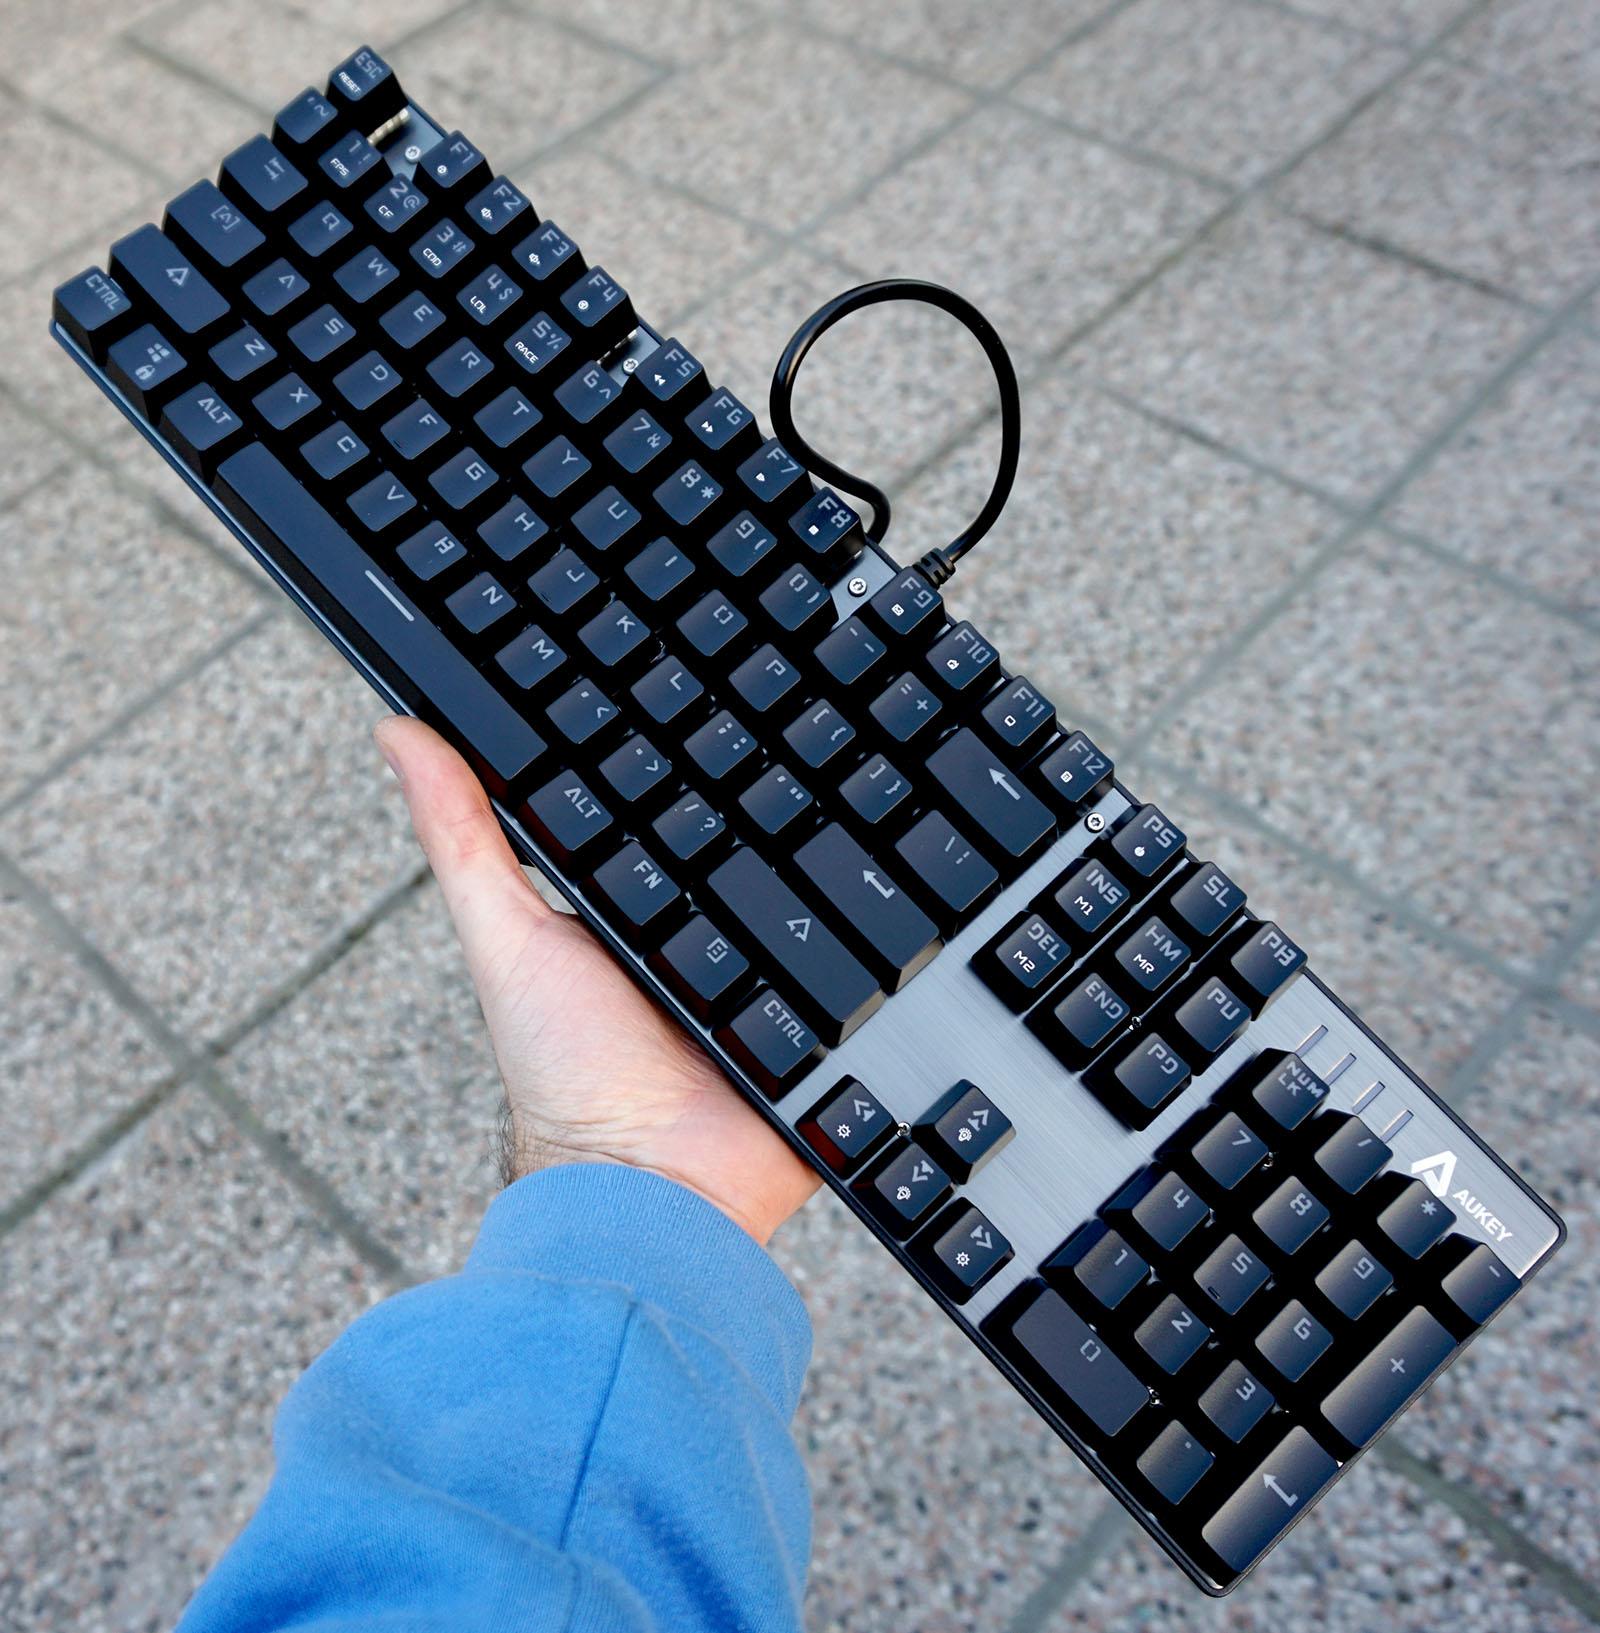 Tastiera meccanica Aukey KM-G3